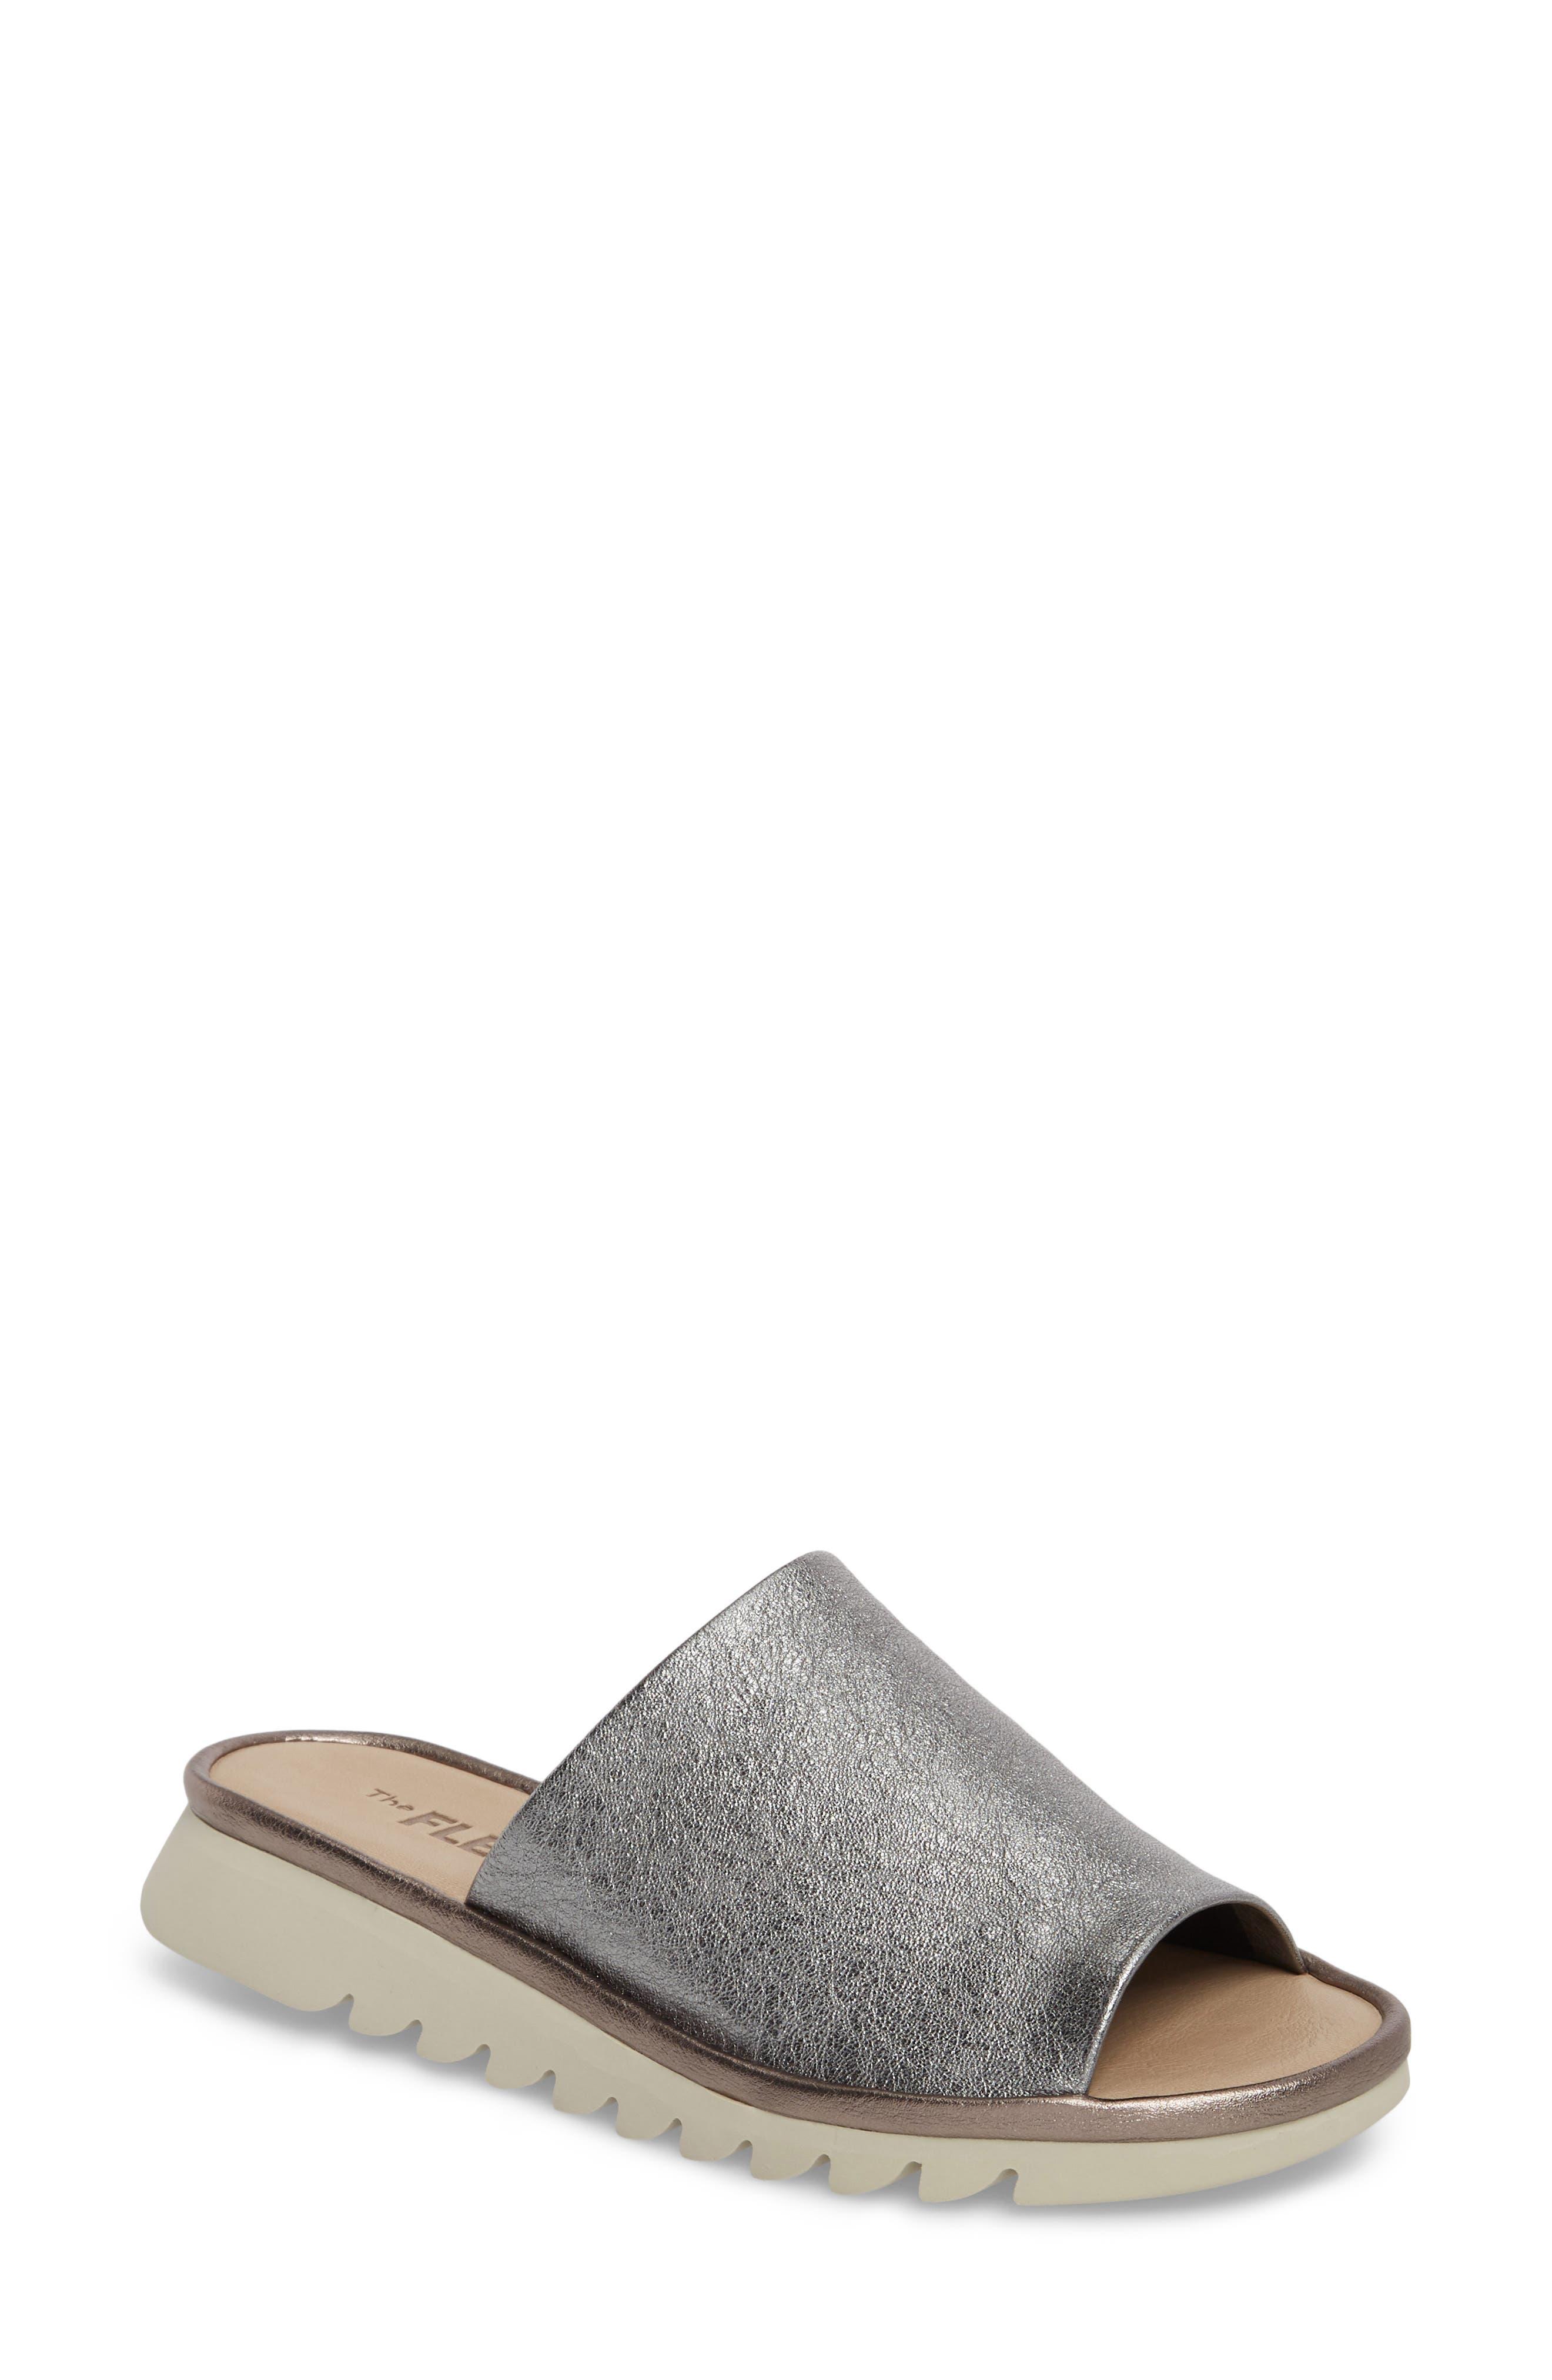 Shore Thing Slide Sandal, Main, color, CANNA DI FUCILE LEATHER